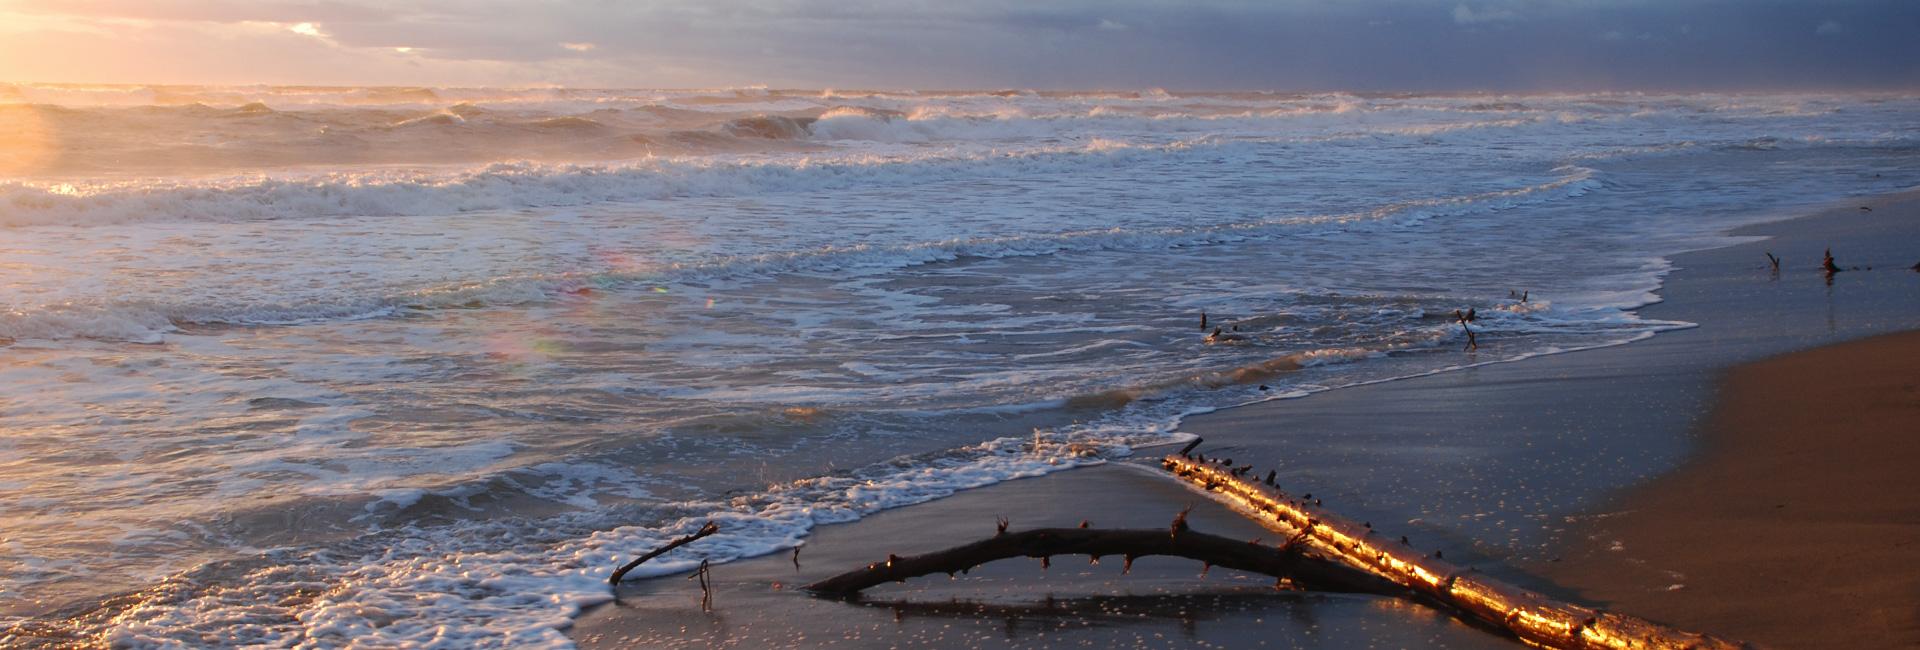 Maremma Sea